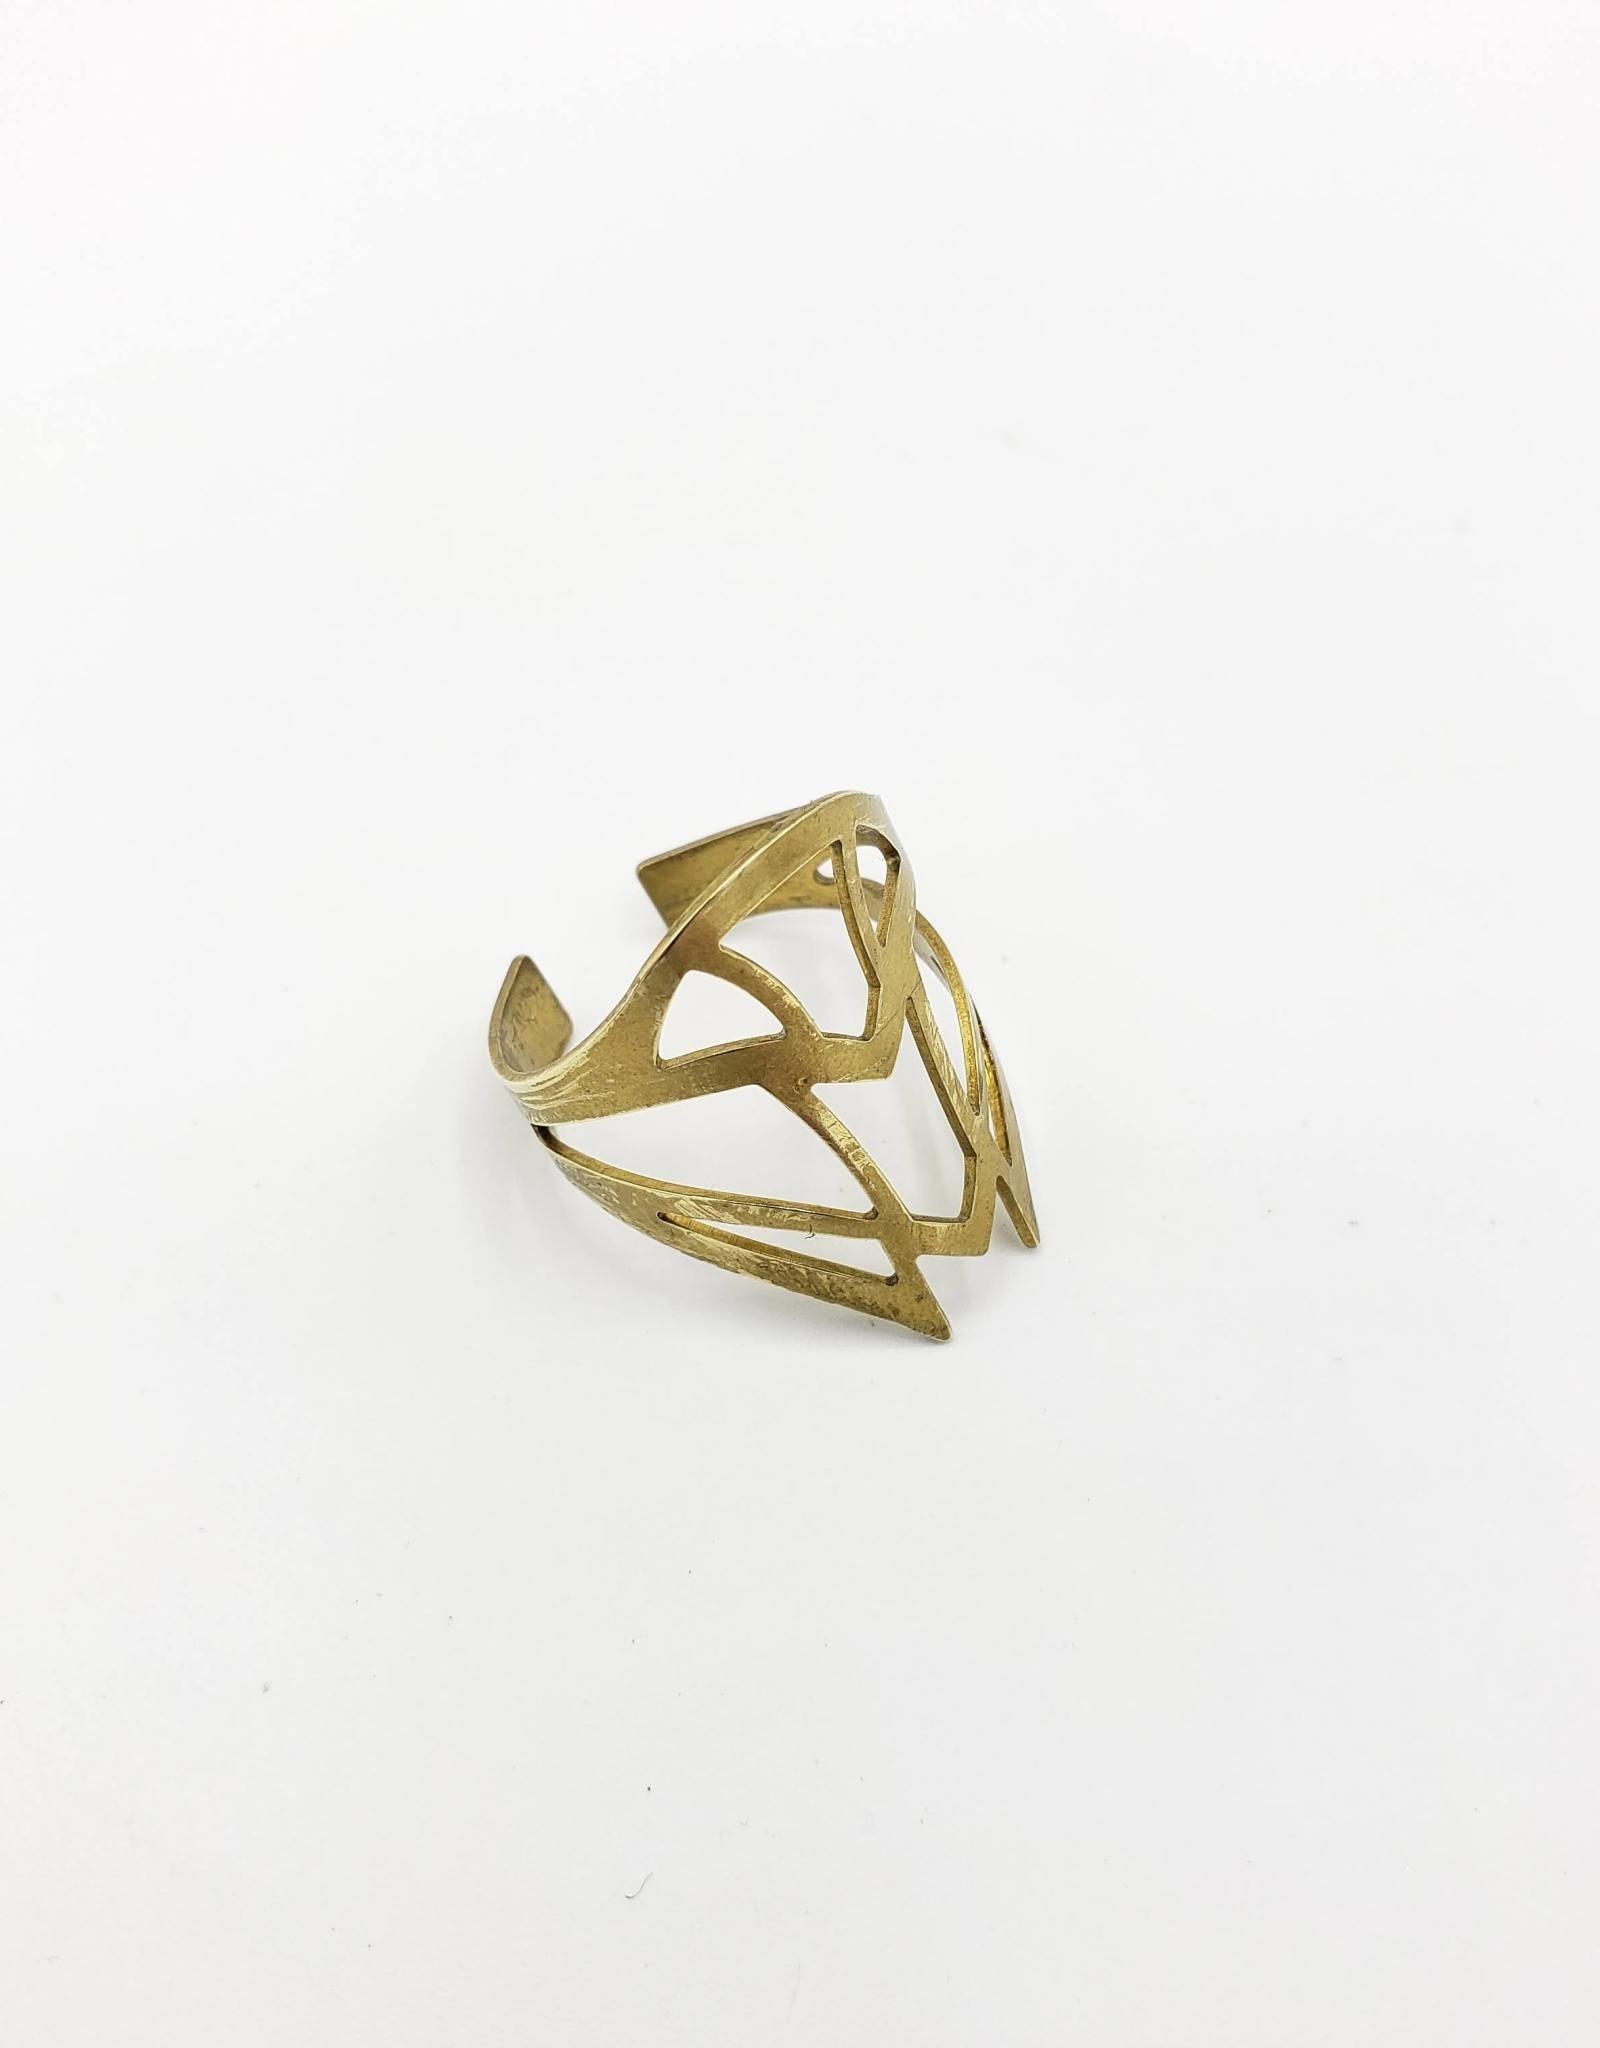 Mishakaudi Ornate Cutout Shield Ring, Brass (adjustable)